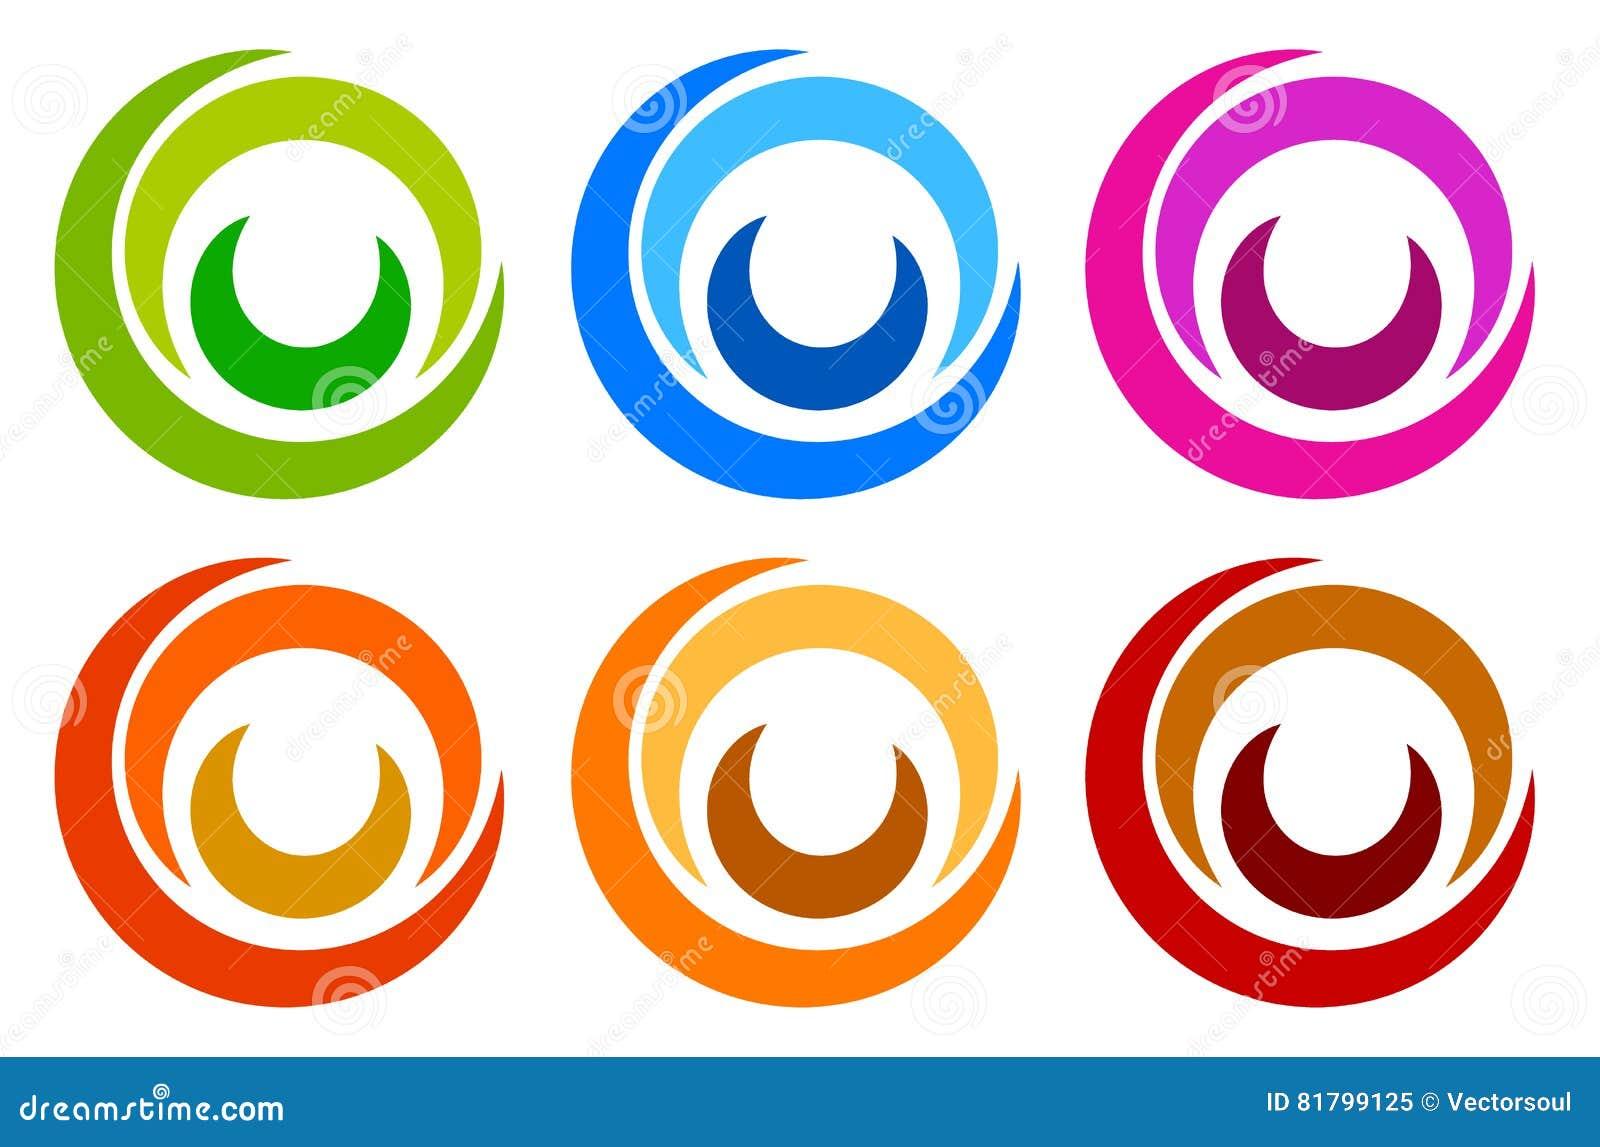 Kleurrijk cirkelembleem, pictogrammalplaatjes gesegmenteerd concentrisch circl